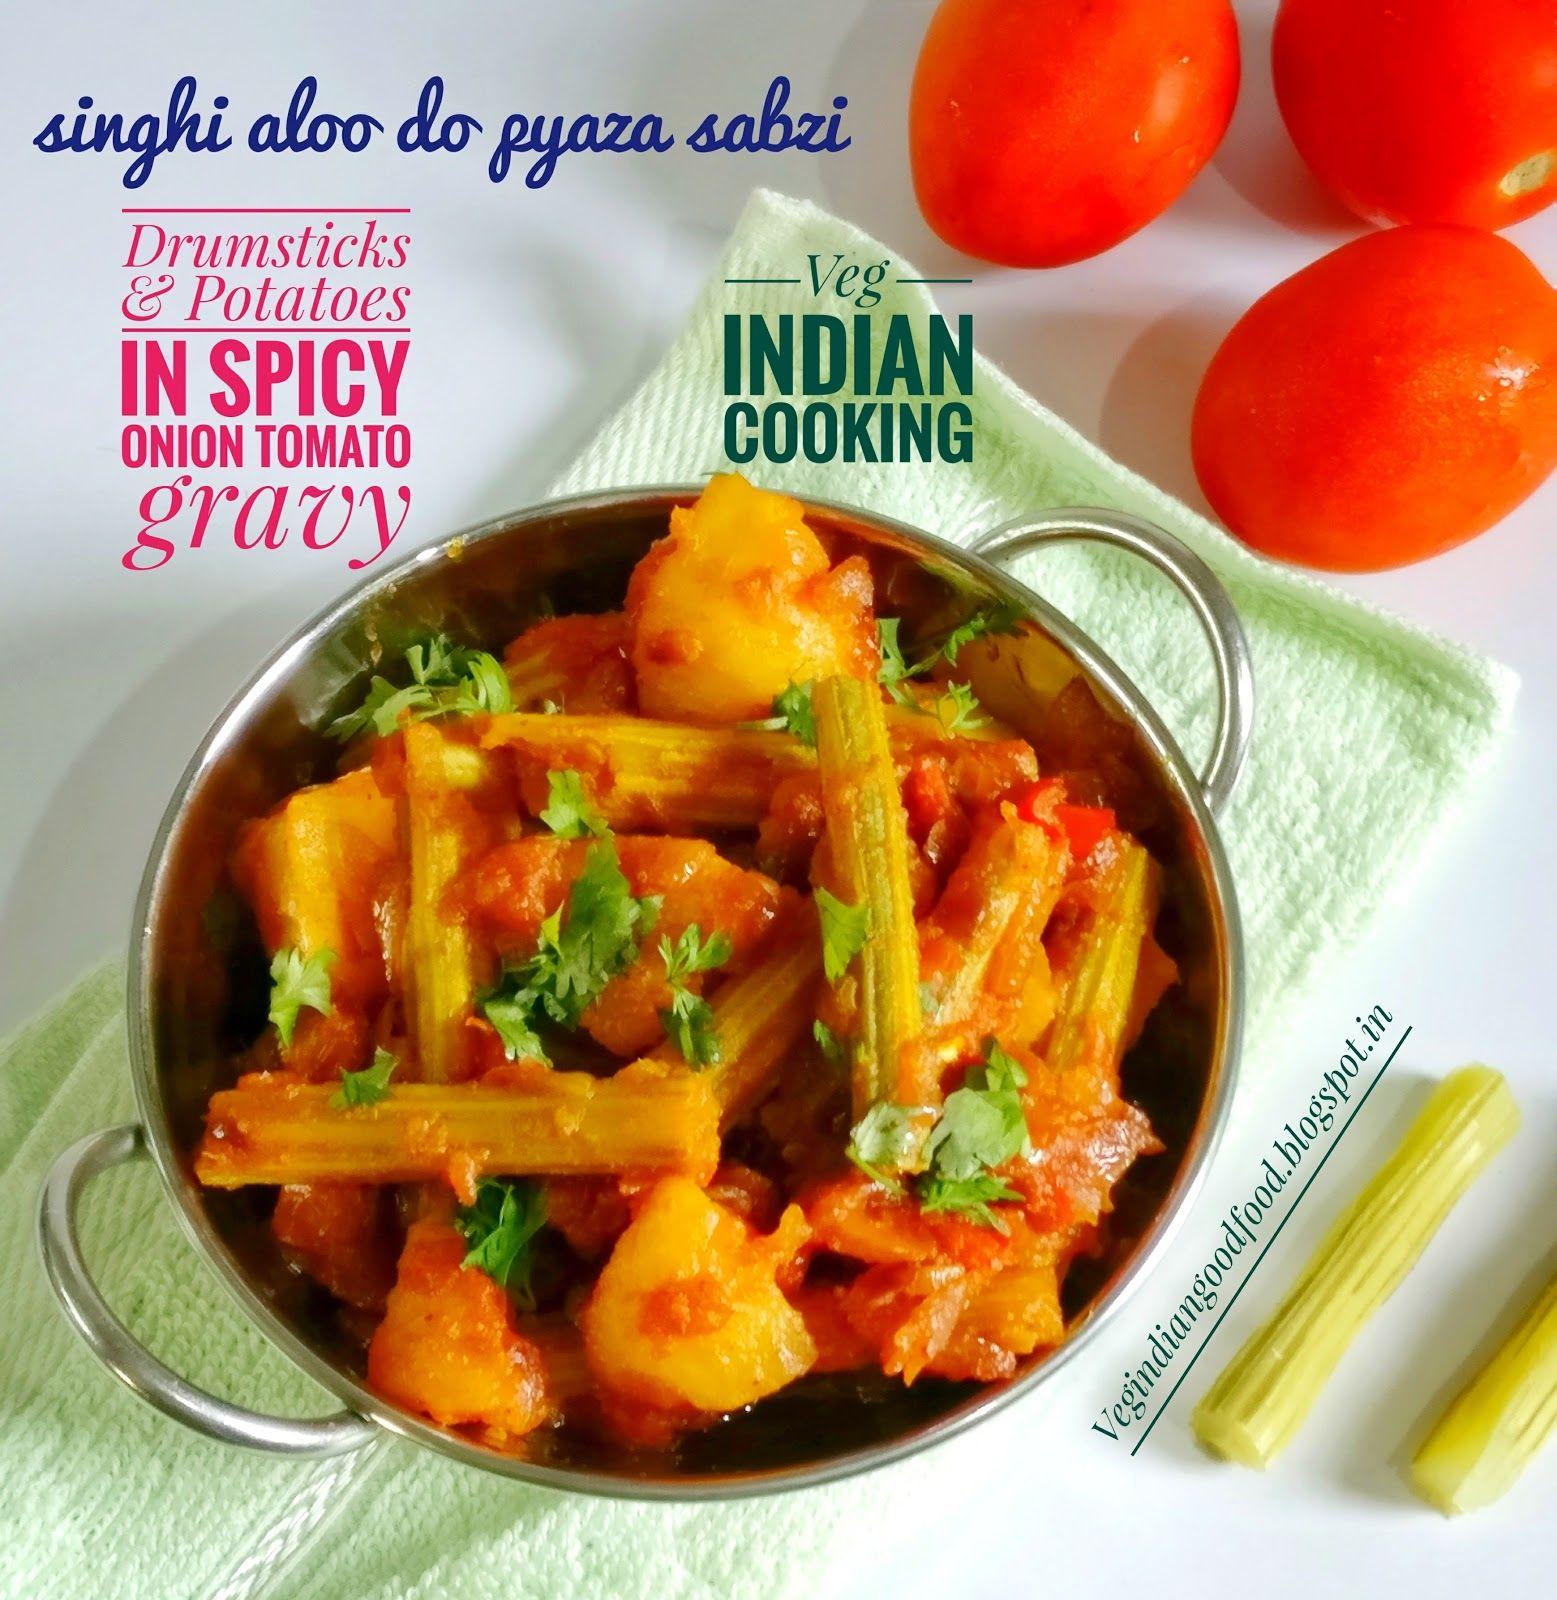 How to make Sahjan Aloo Do Pyaza Recipe | Drumstick & Potato Vegetable In Spicy Onion Tomato Gravy | Shajan Phali Ki Sabzi |  | Mori...